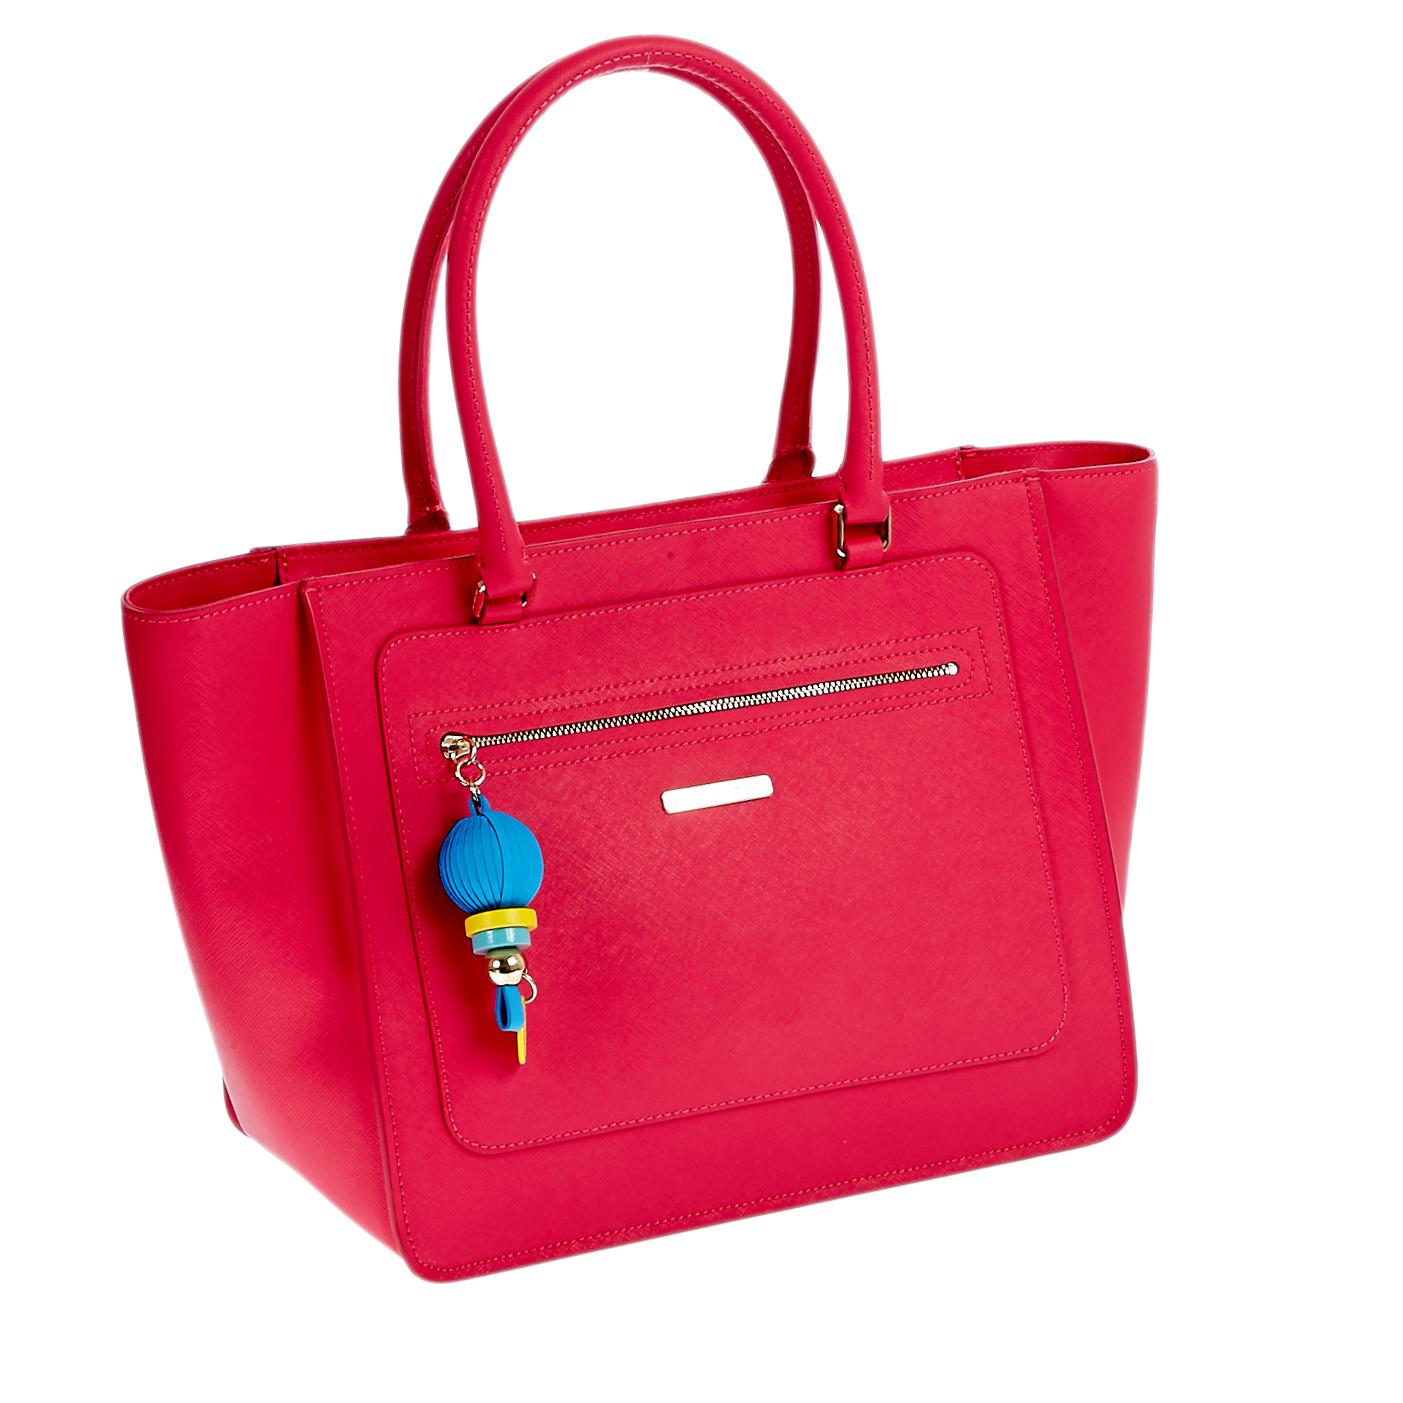 JUICY COUTURE – Γυναικεία τσάντα Juicy Couture κόκκινη-φούξια 1441262.0-004H